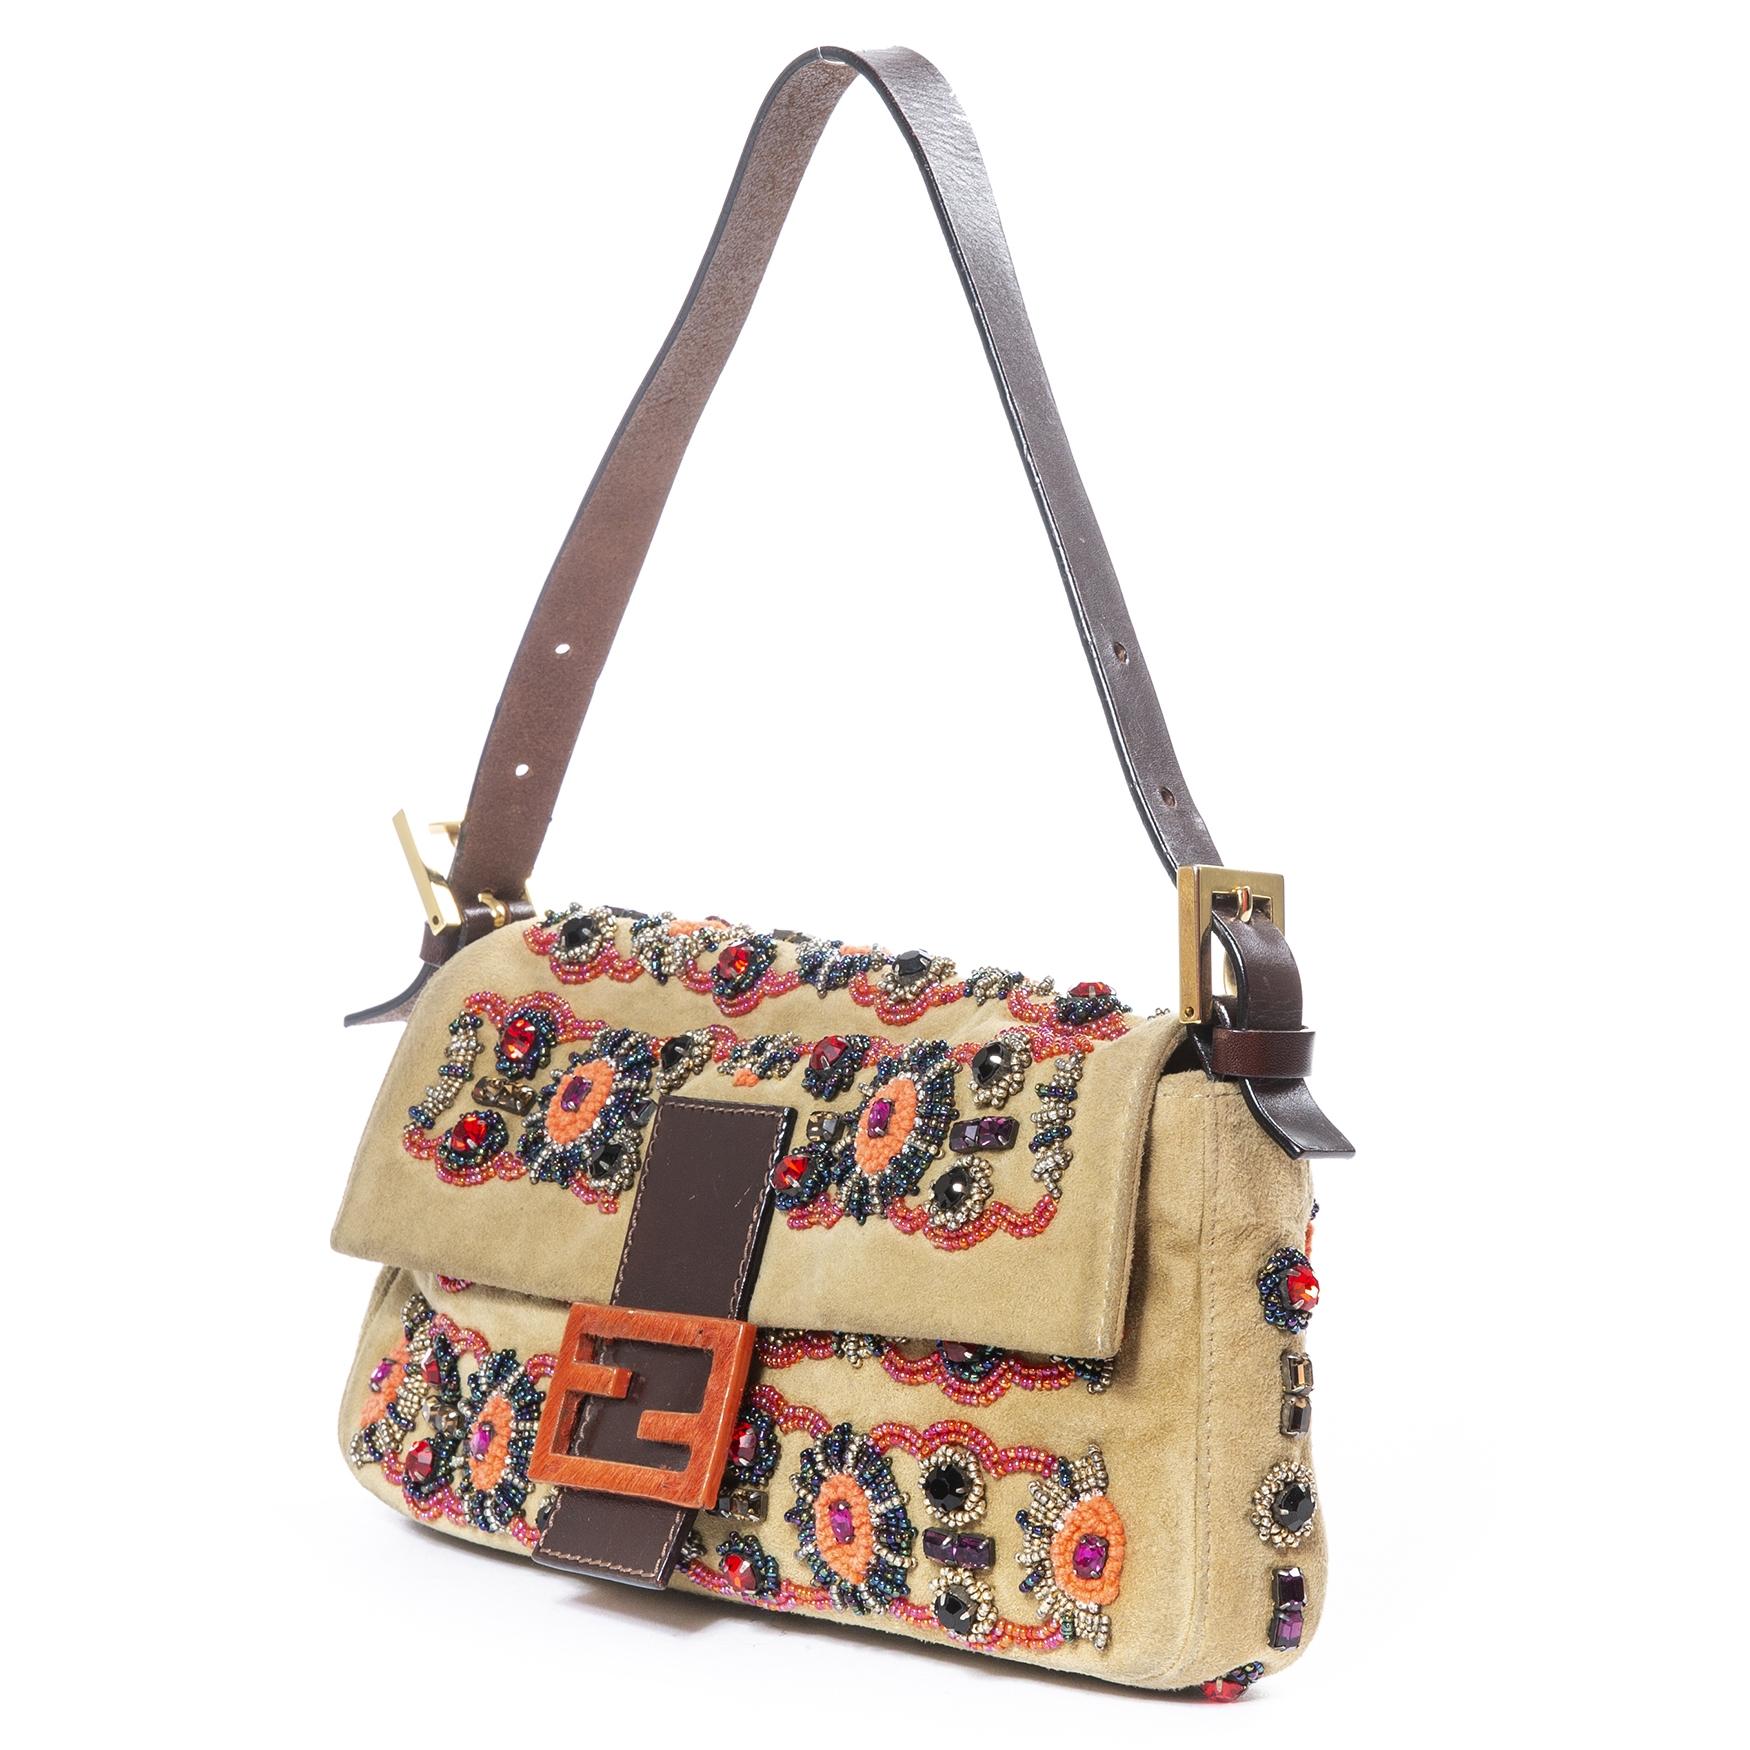 afb8dad8ac6b Labellov Shop Authentic Vintage Luxury Designer Handbags Online ...